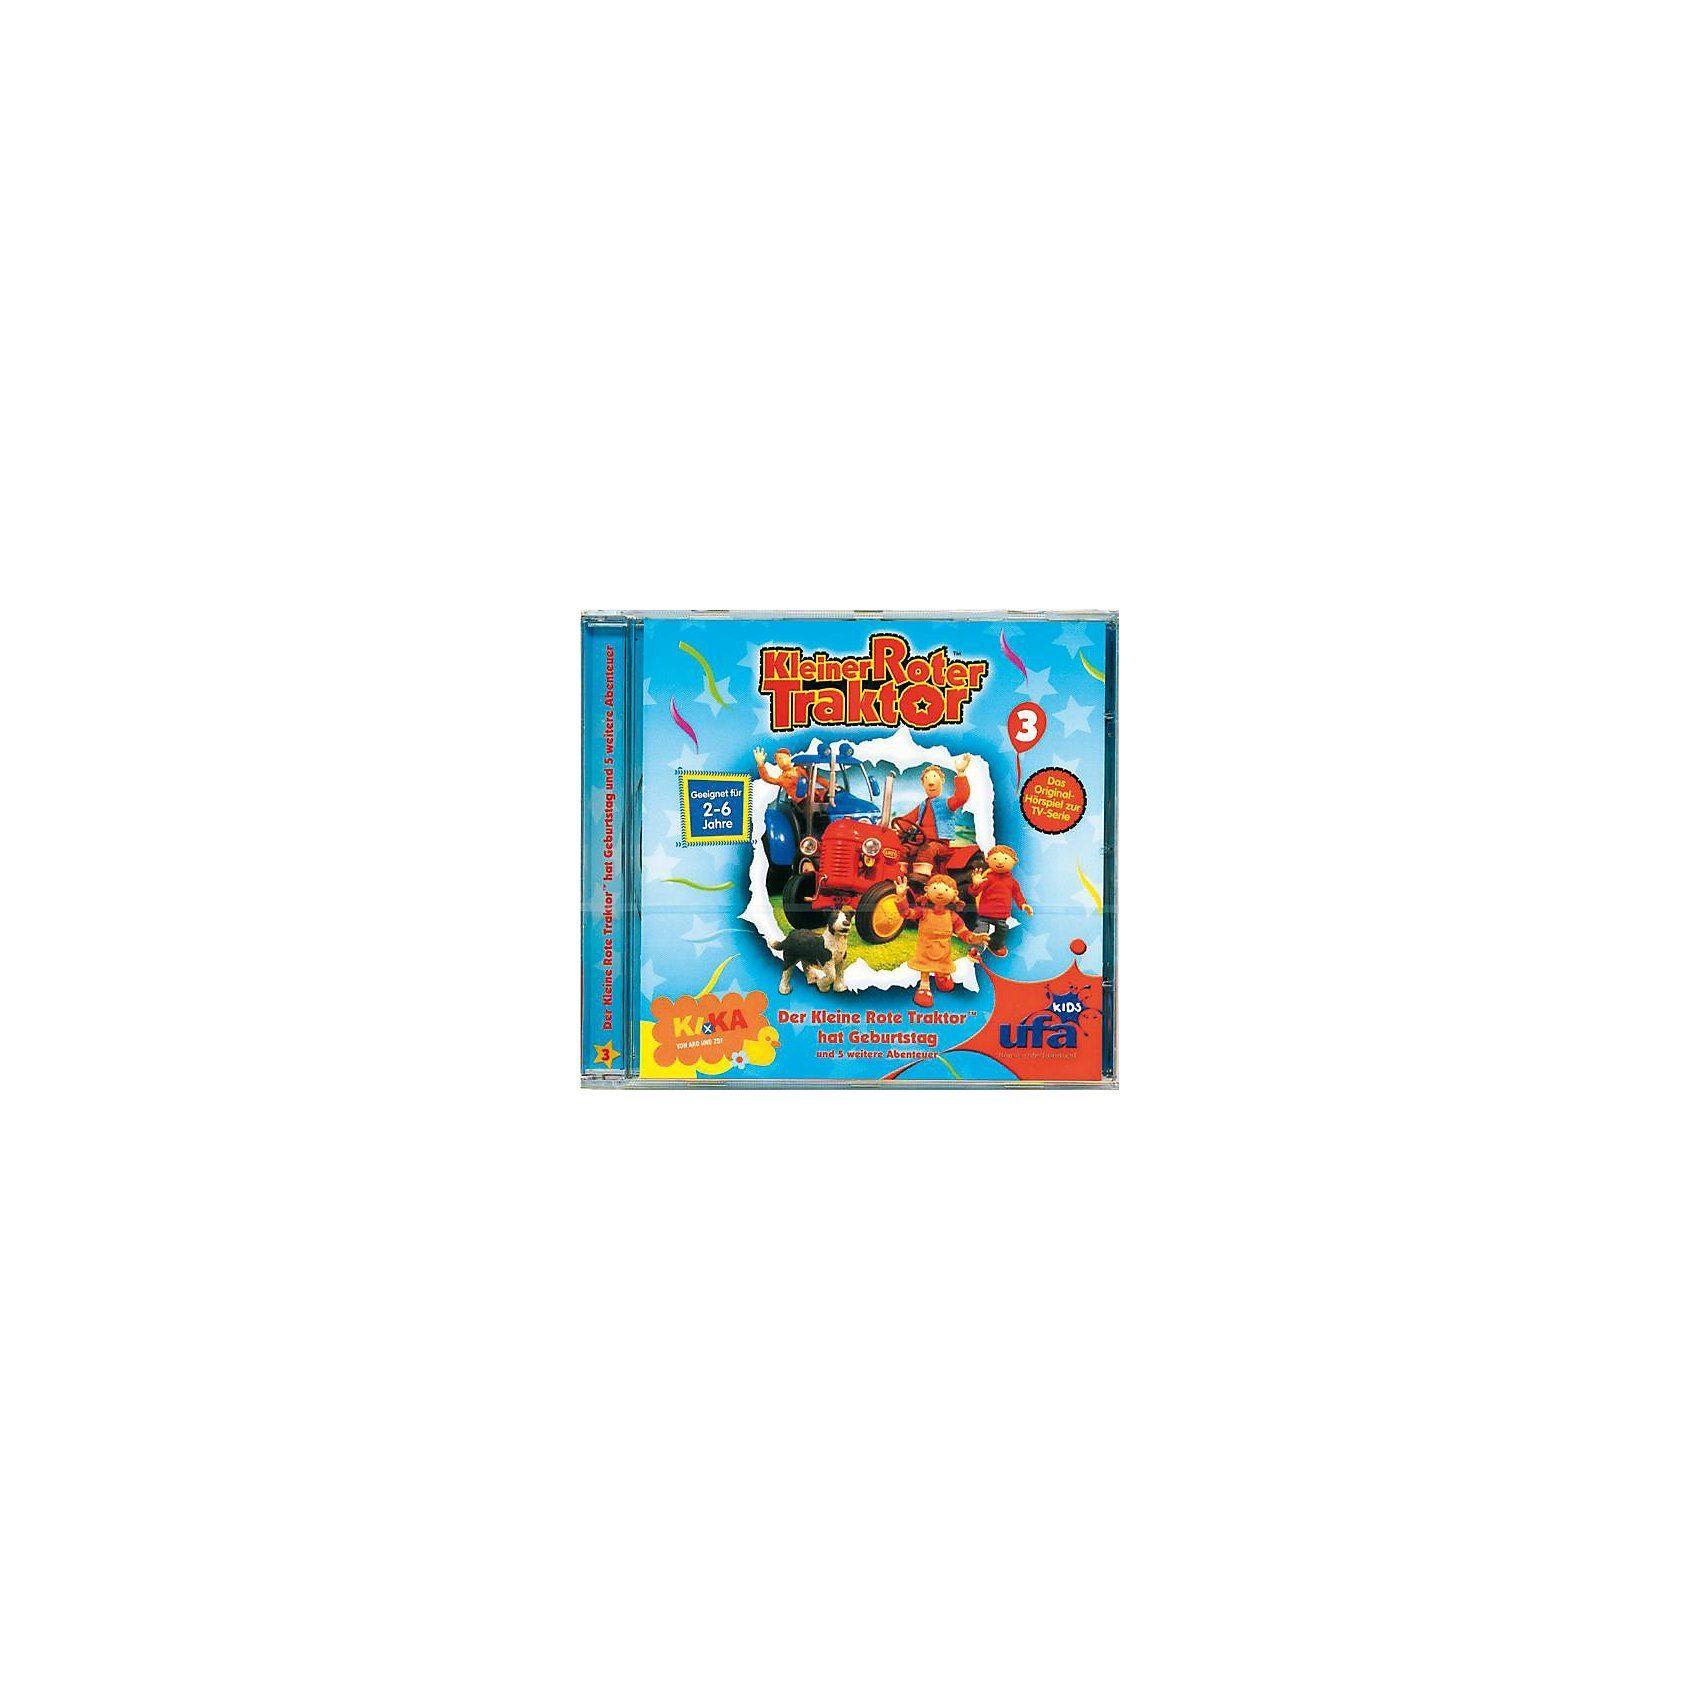 Sony CD Kleiner Roter Traktor 03 (Geburtstag)